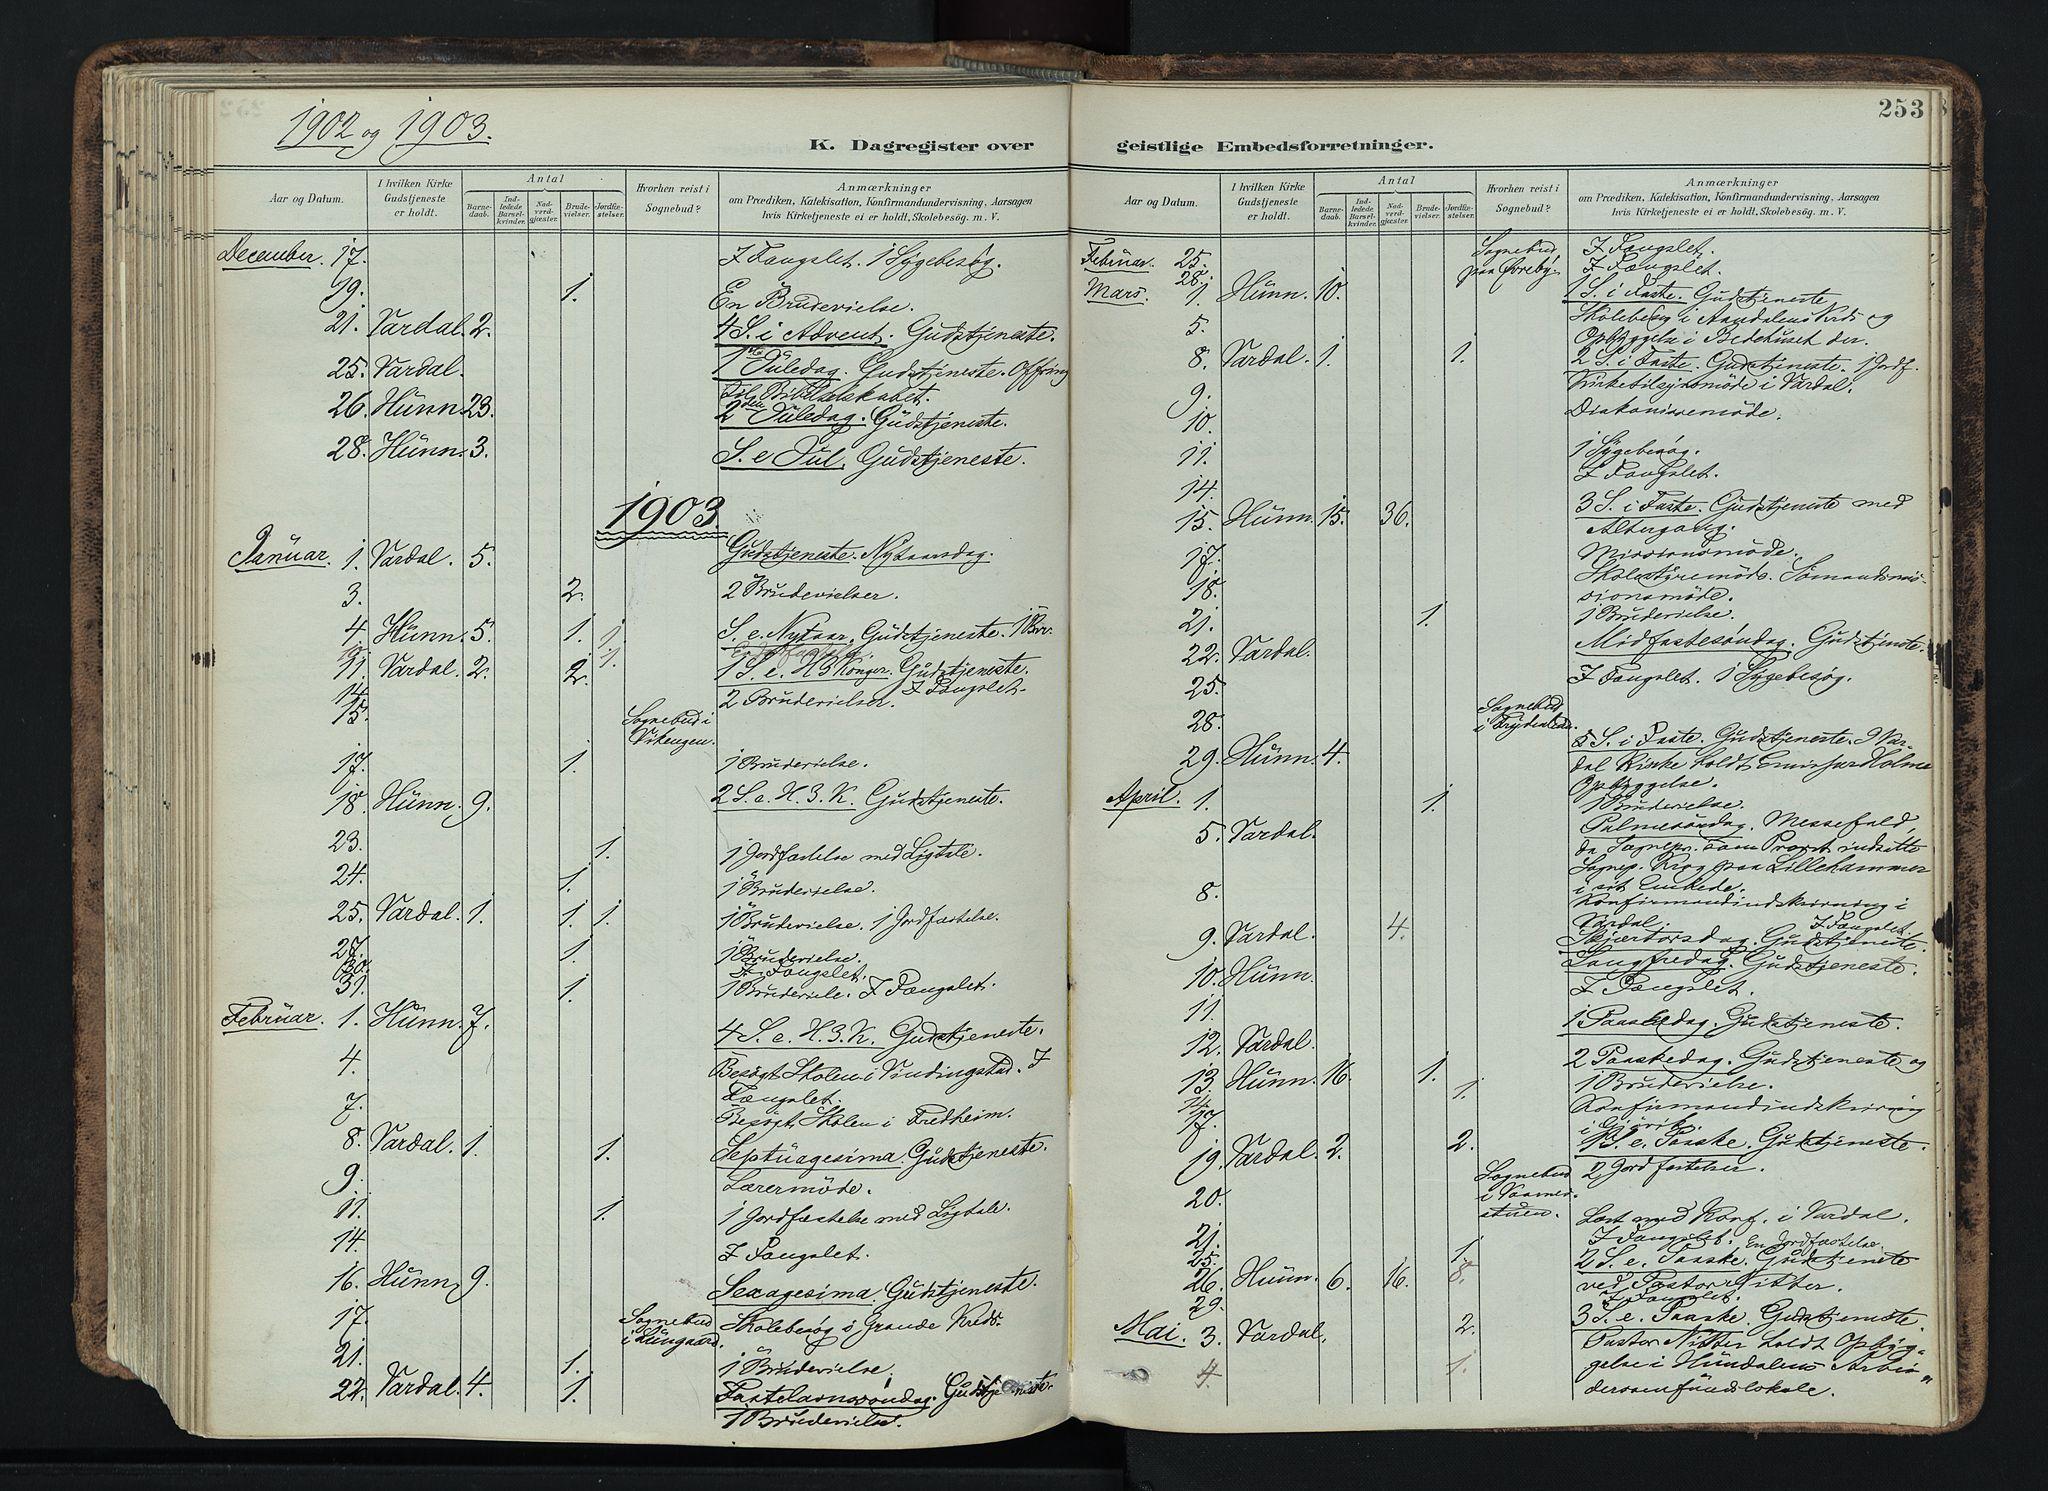 SAH, Vardal prestekontor, H/Ha/Haa/L0019: Ministerialbok nr. 19, 1893-1907, s. 253